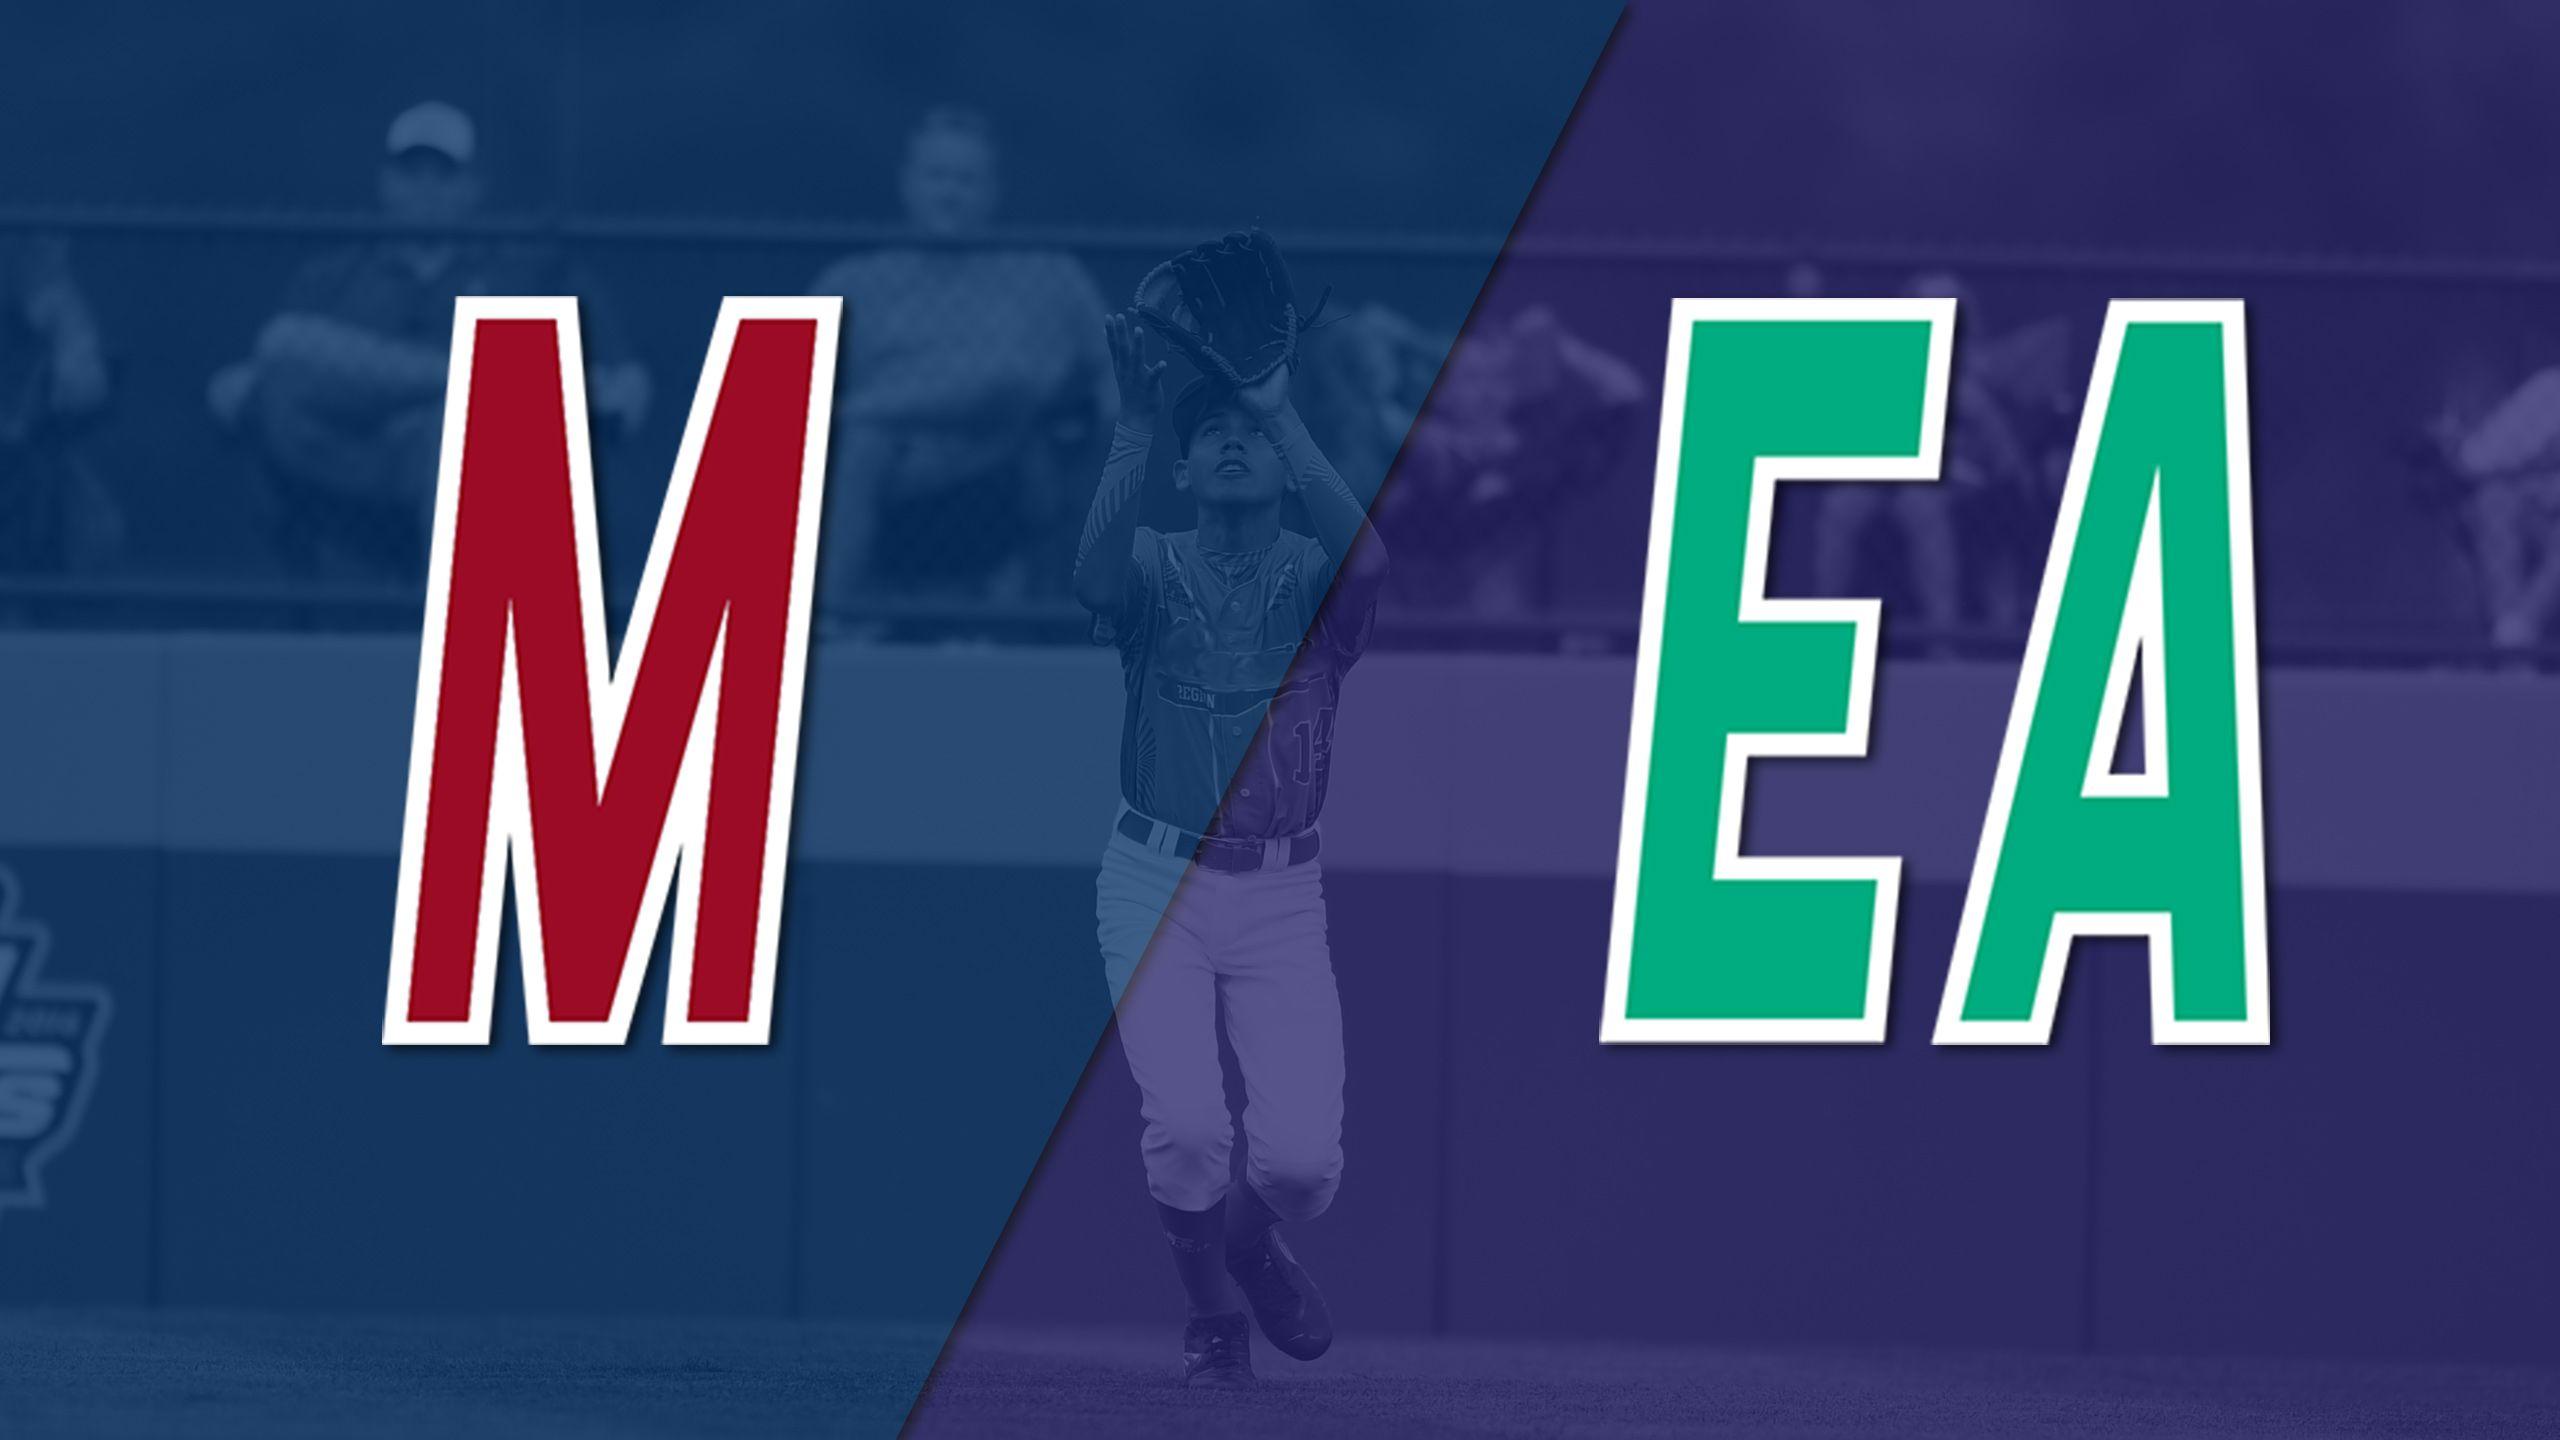 Reynosa, Mexico vs. Emilia, Italy (Elimination Game) (Little League World Series)